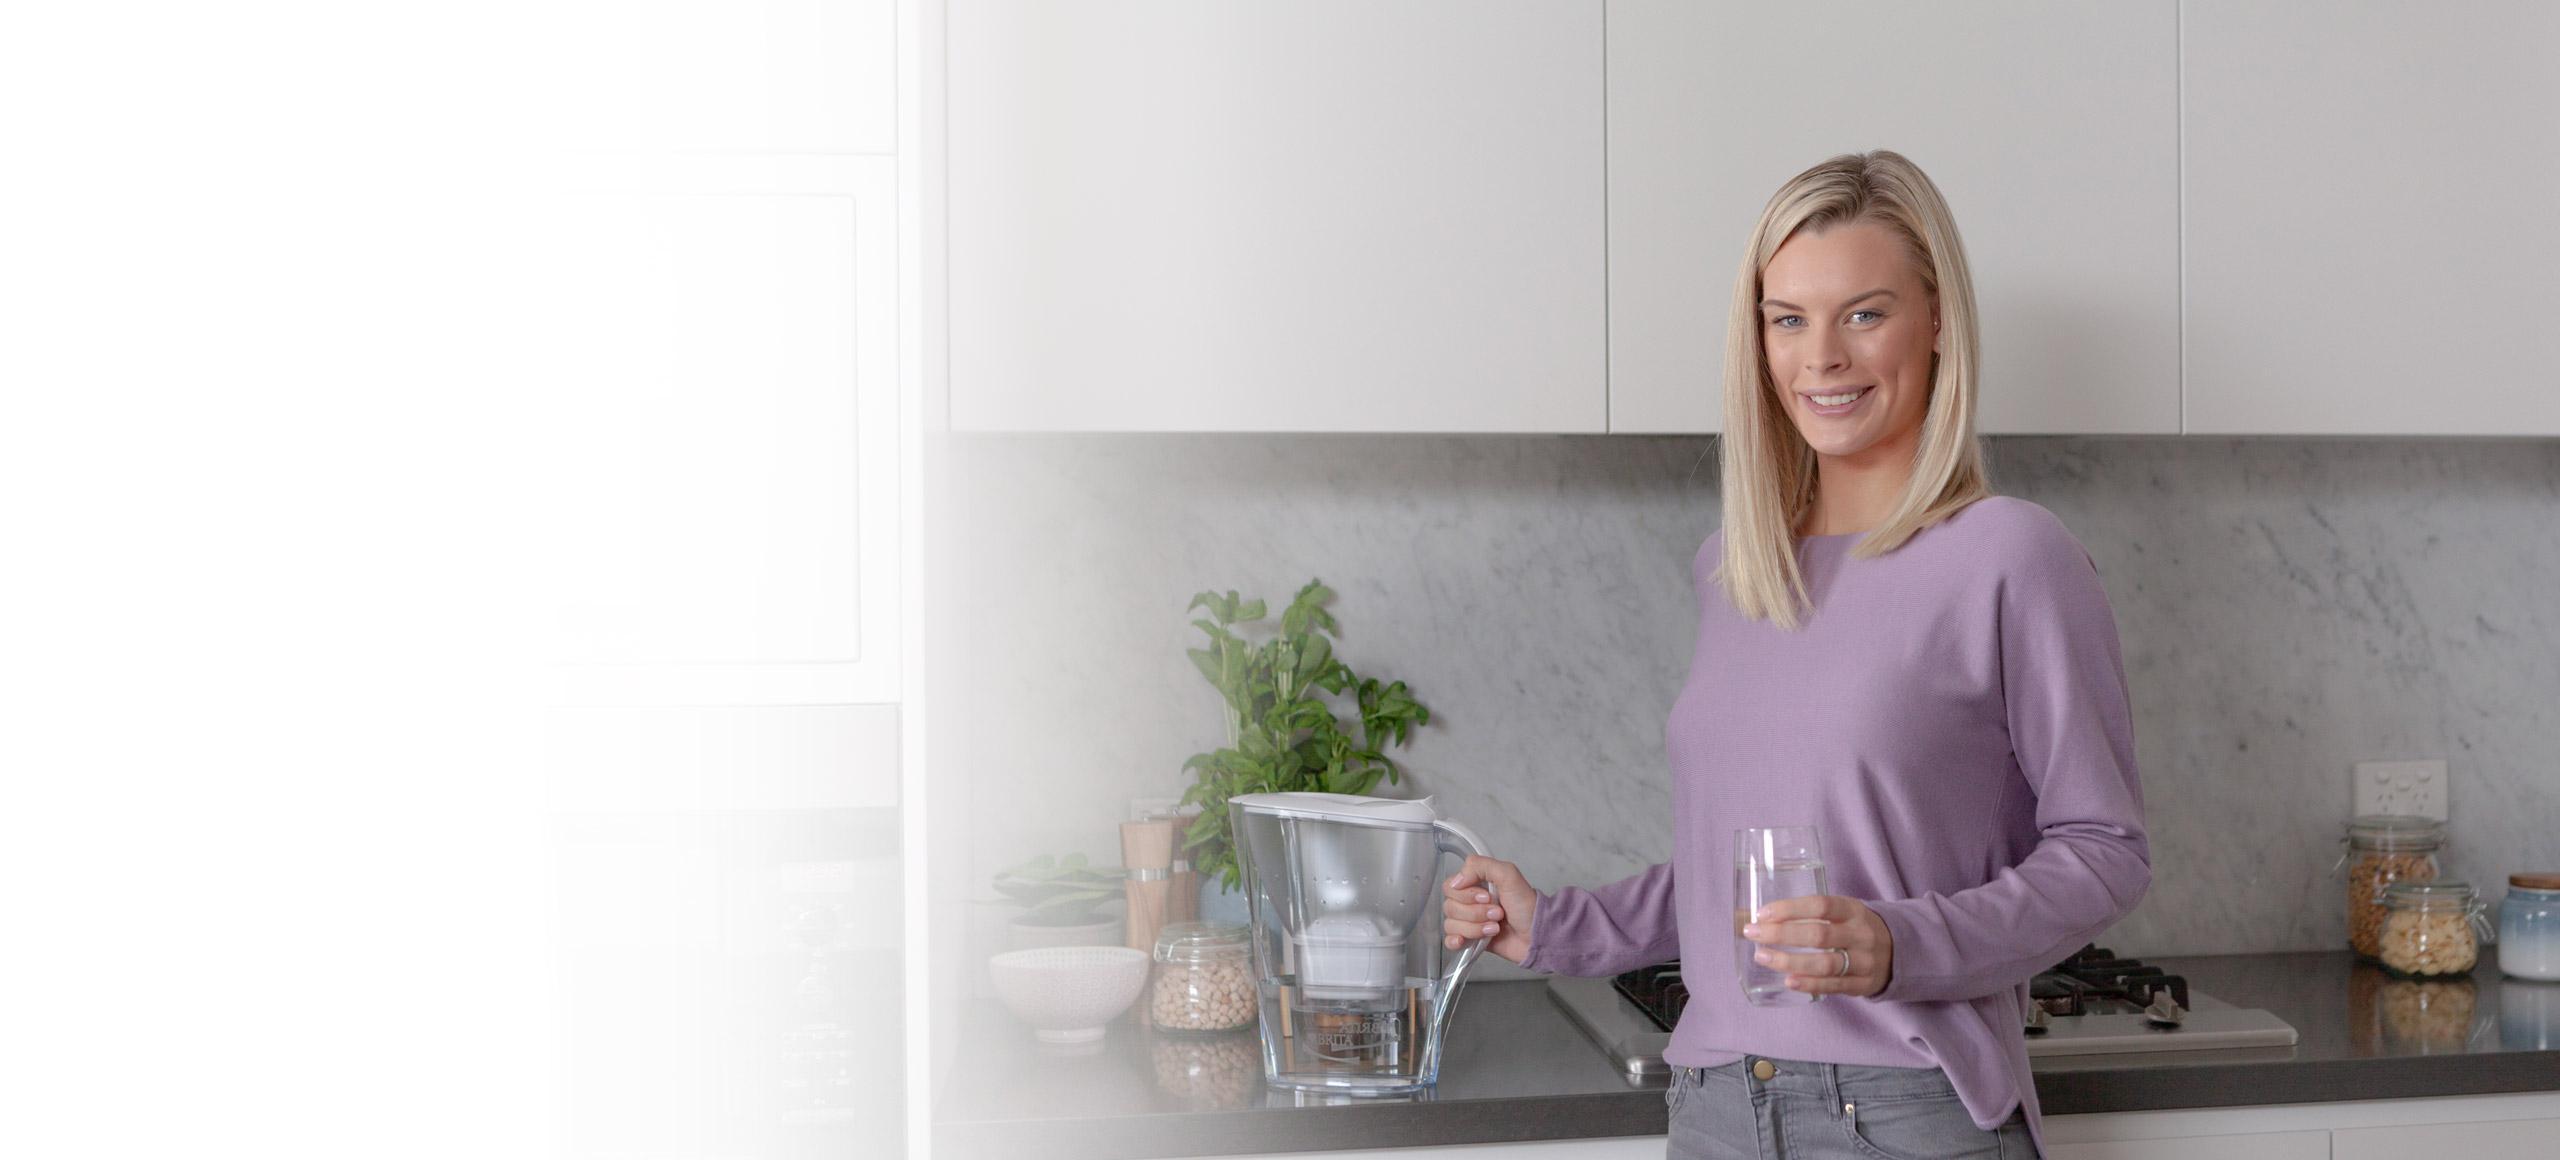 Girl in purple holding BRITA jug